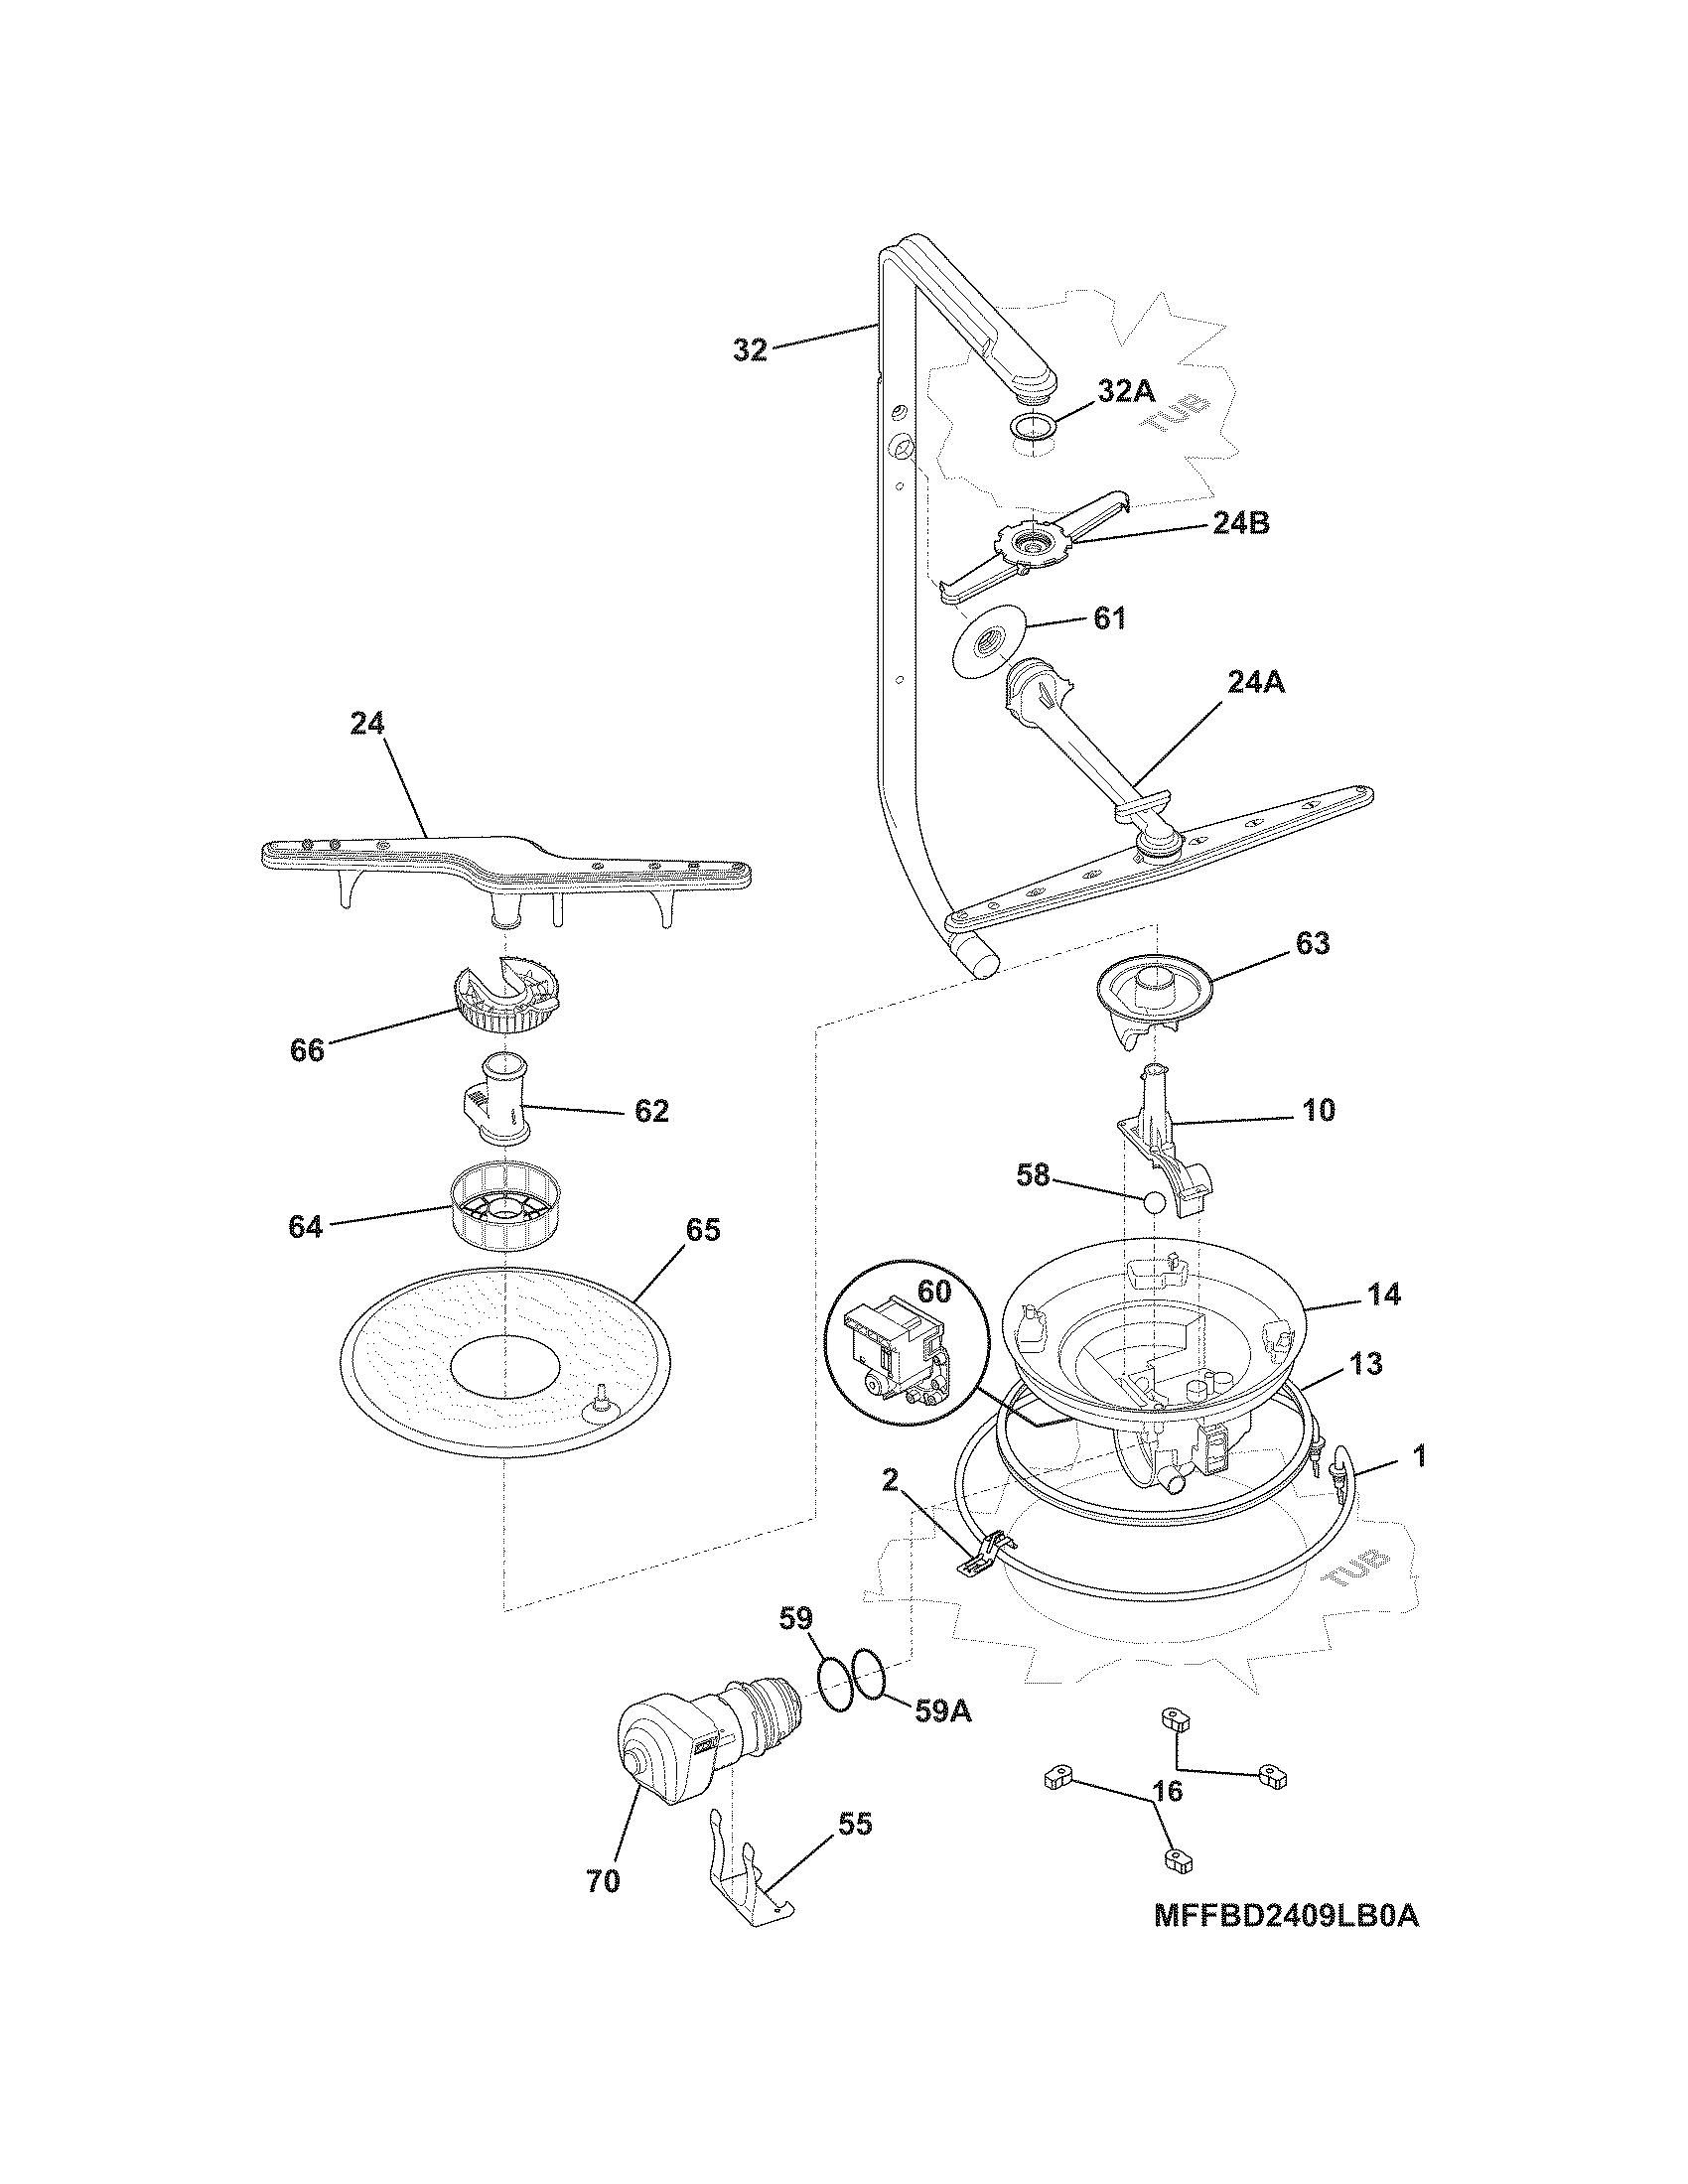 Frigidaire: Frigidaire Dishwasher Parts Diagram